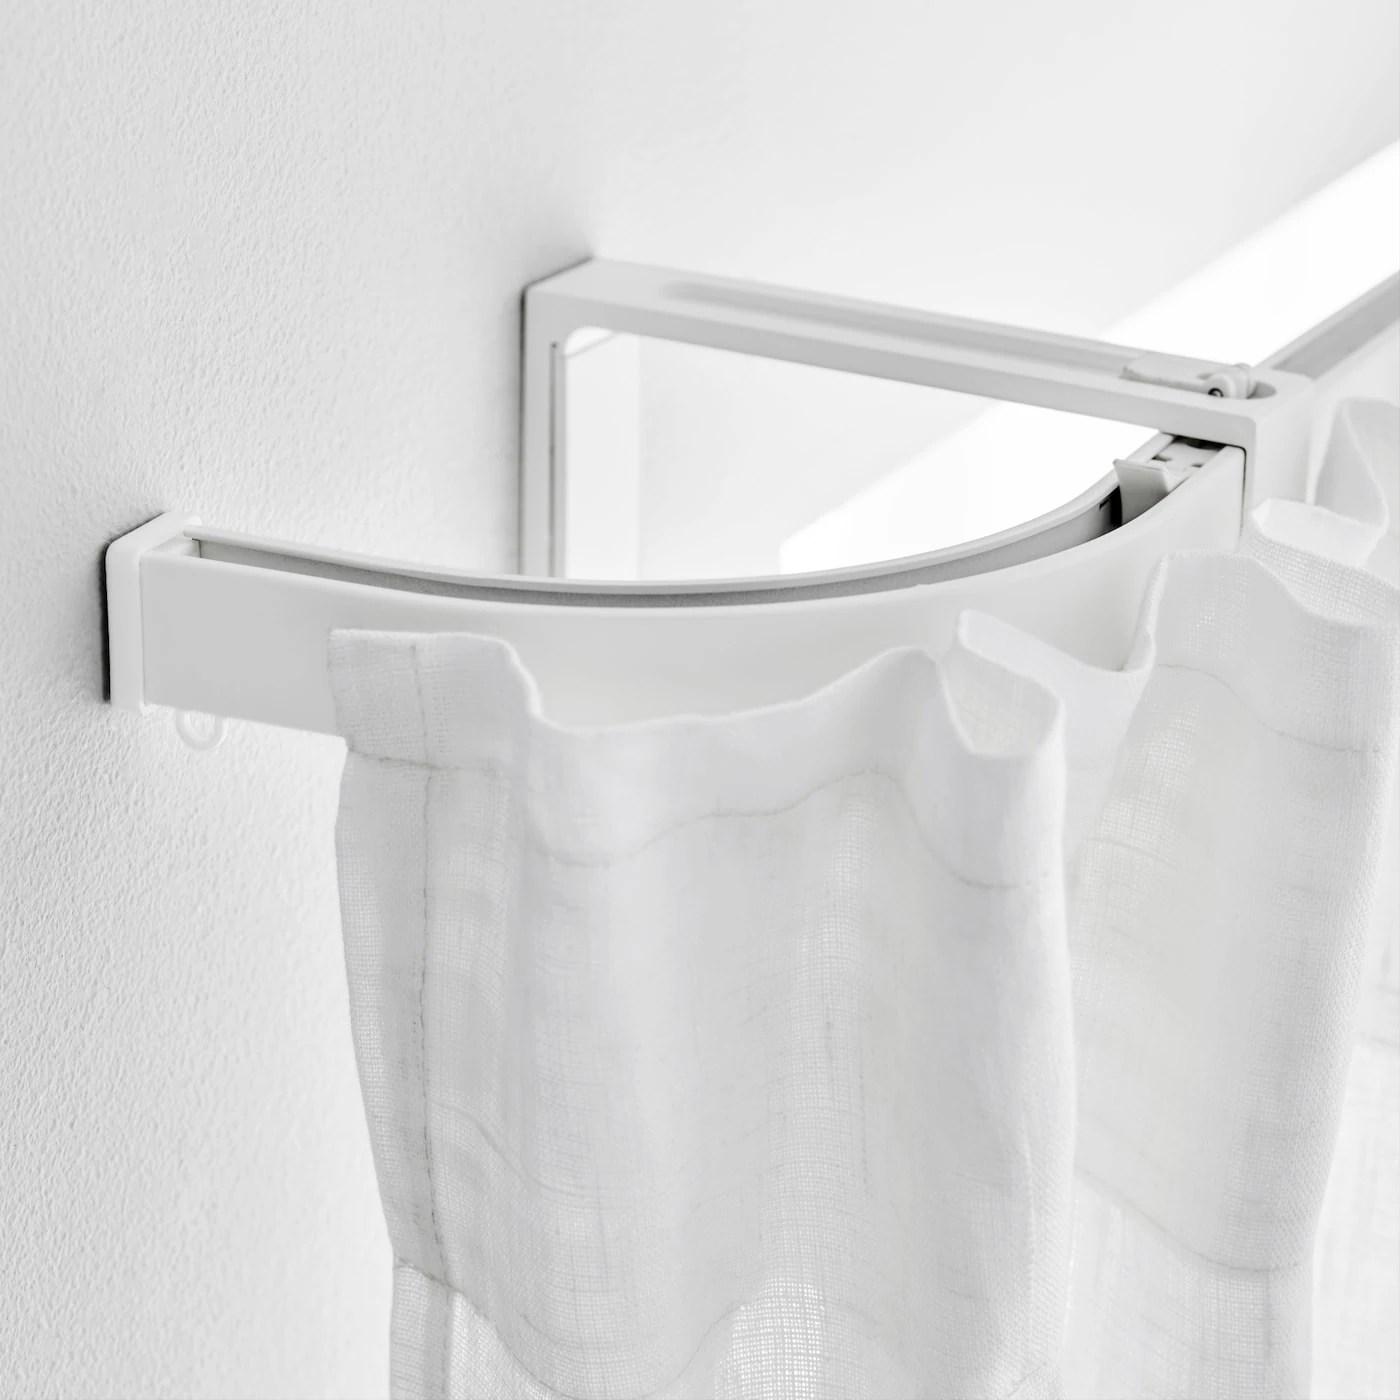 Leroy merlin mobili bagno catalogo: Binari E Sistemi Per Tende Vigda Ikea Svizzera